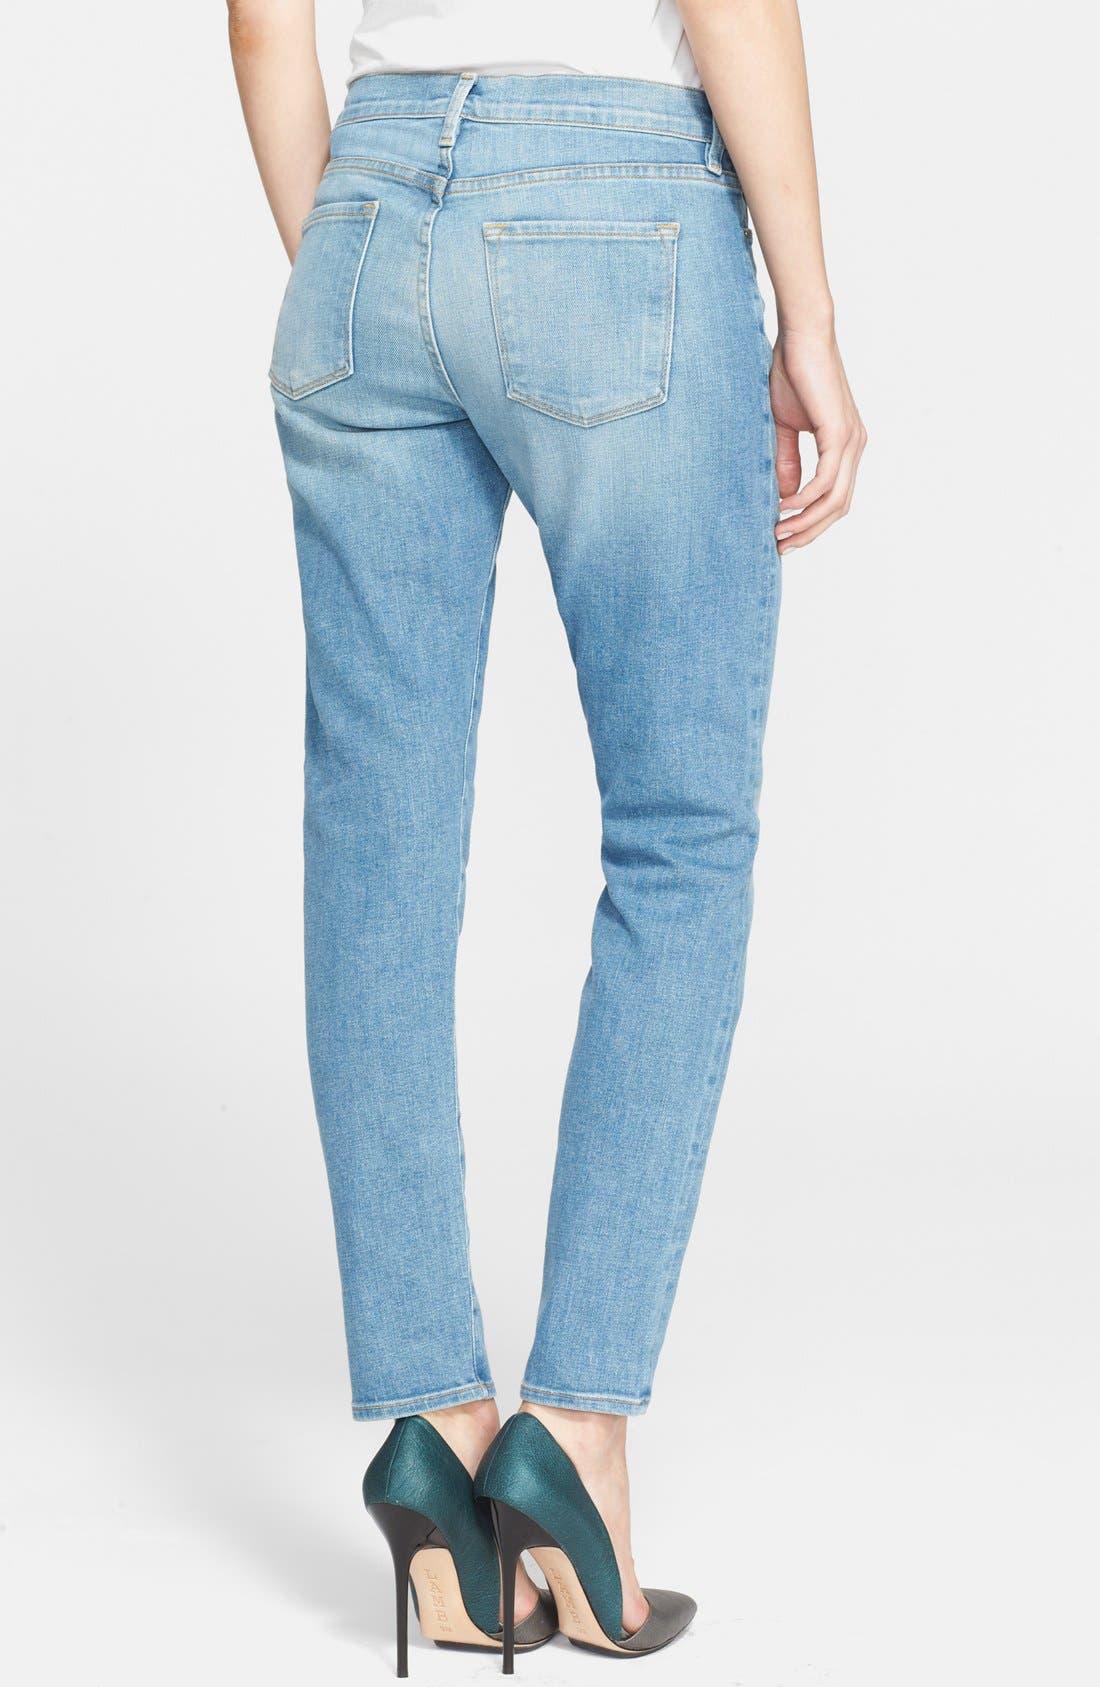 Alternate Image 2  - Frame Denim 'Le Garcon' Boyfriend Jeans (Exmouth)